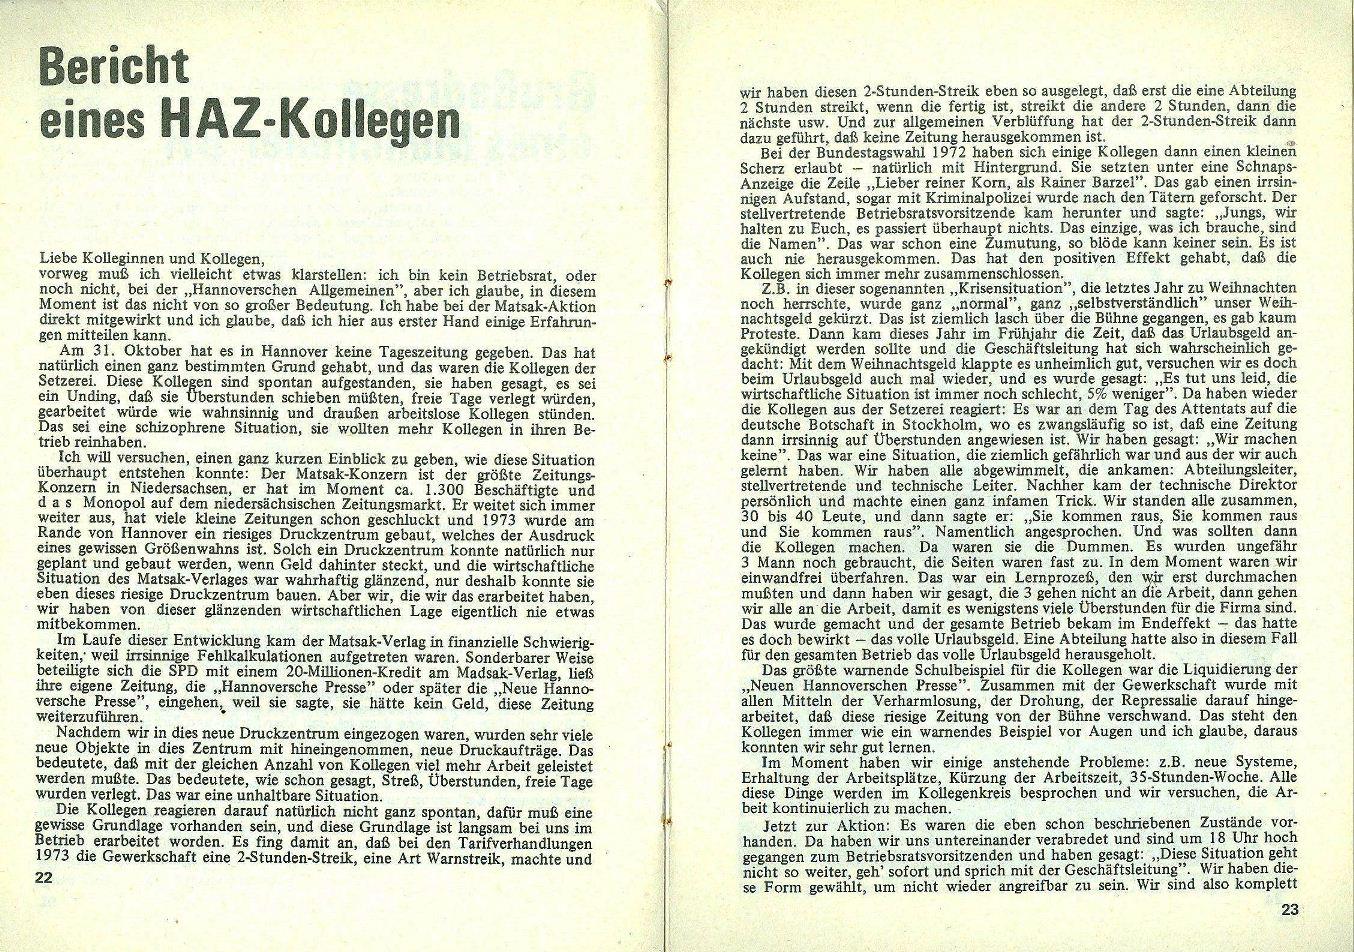 Betriebsraeteveranstaltung_1975_012